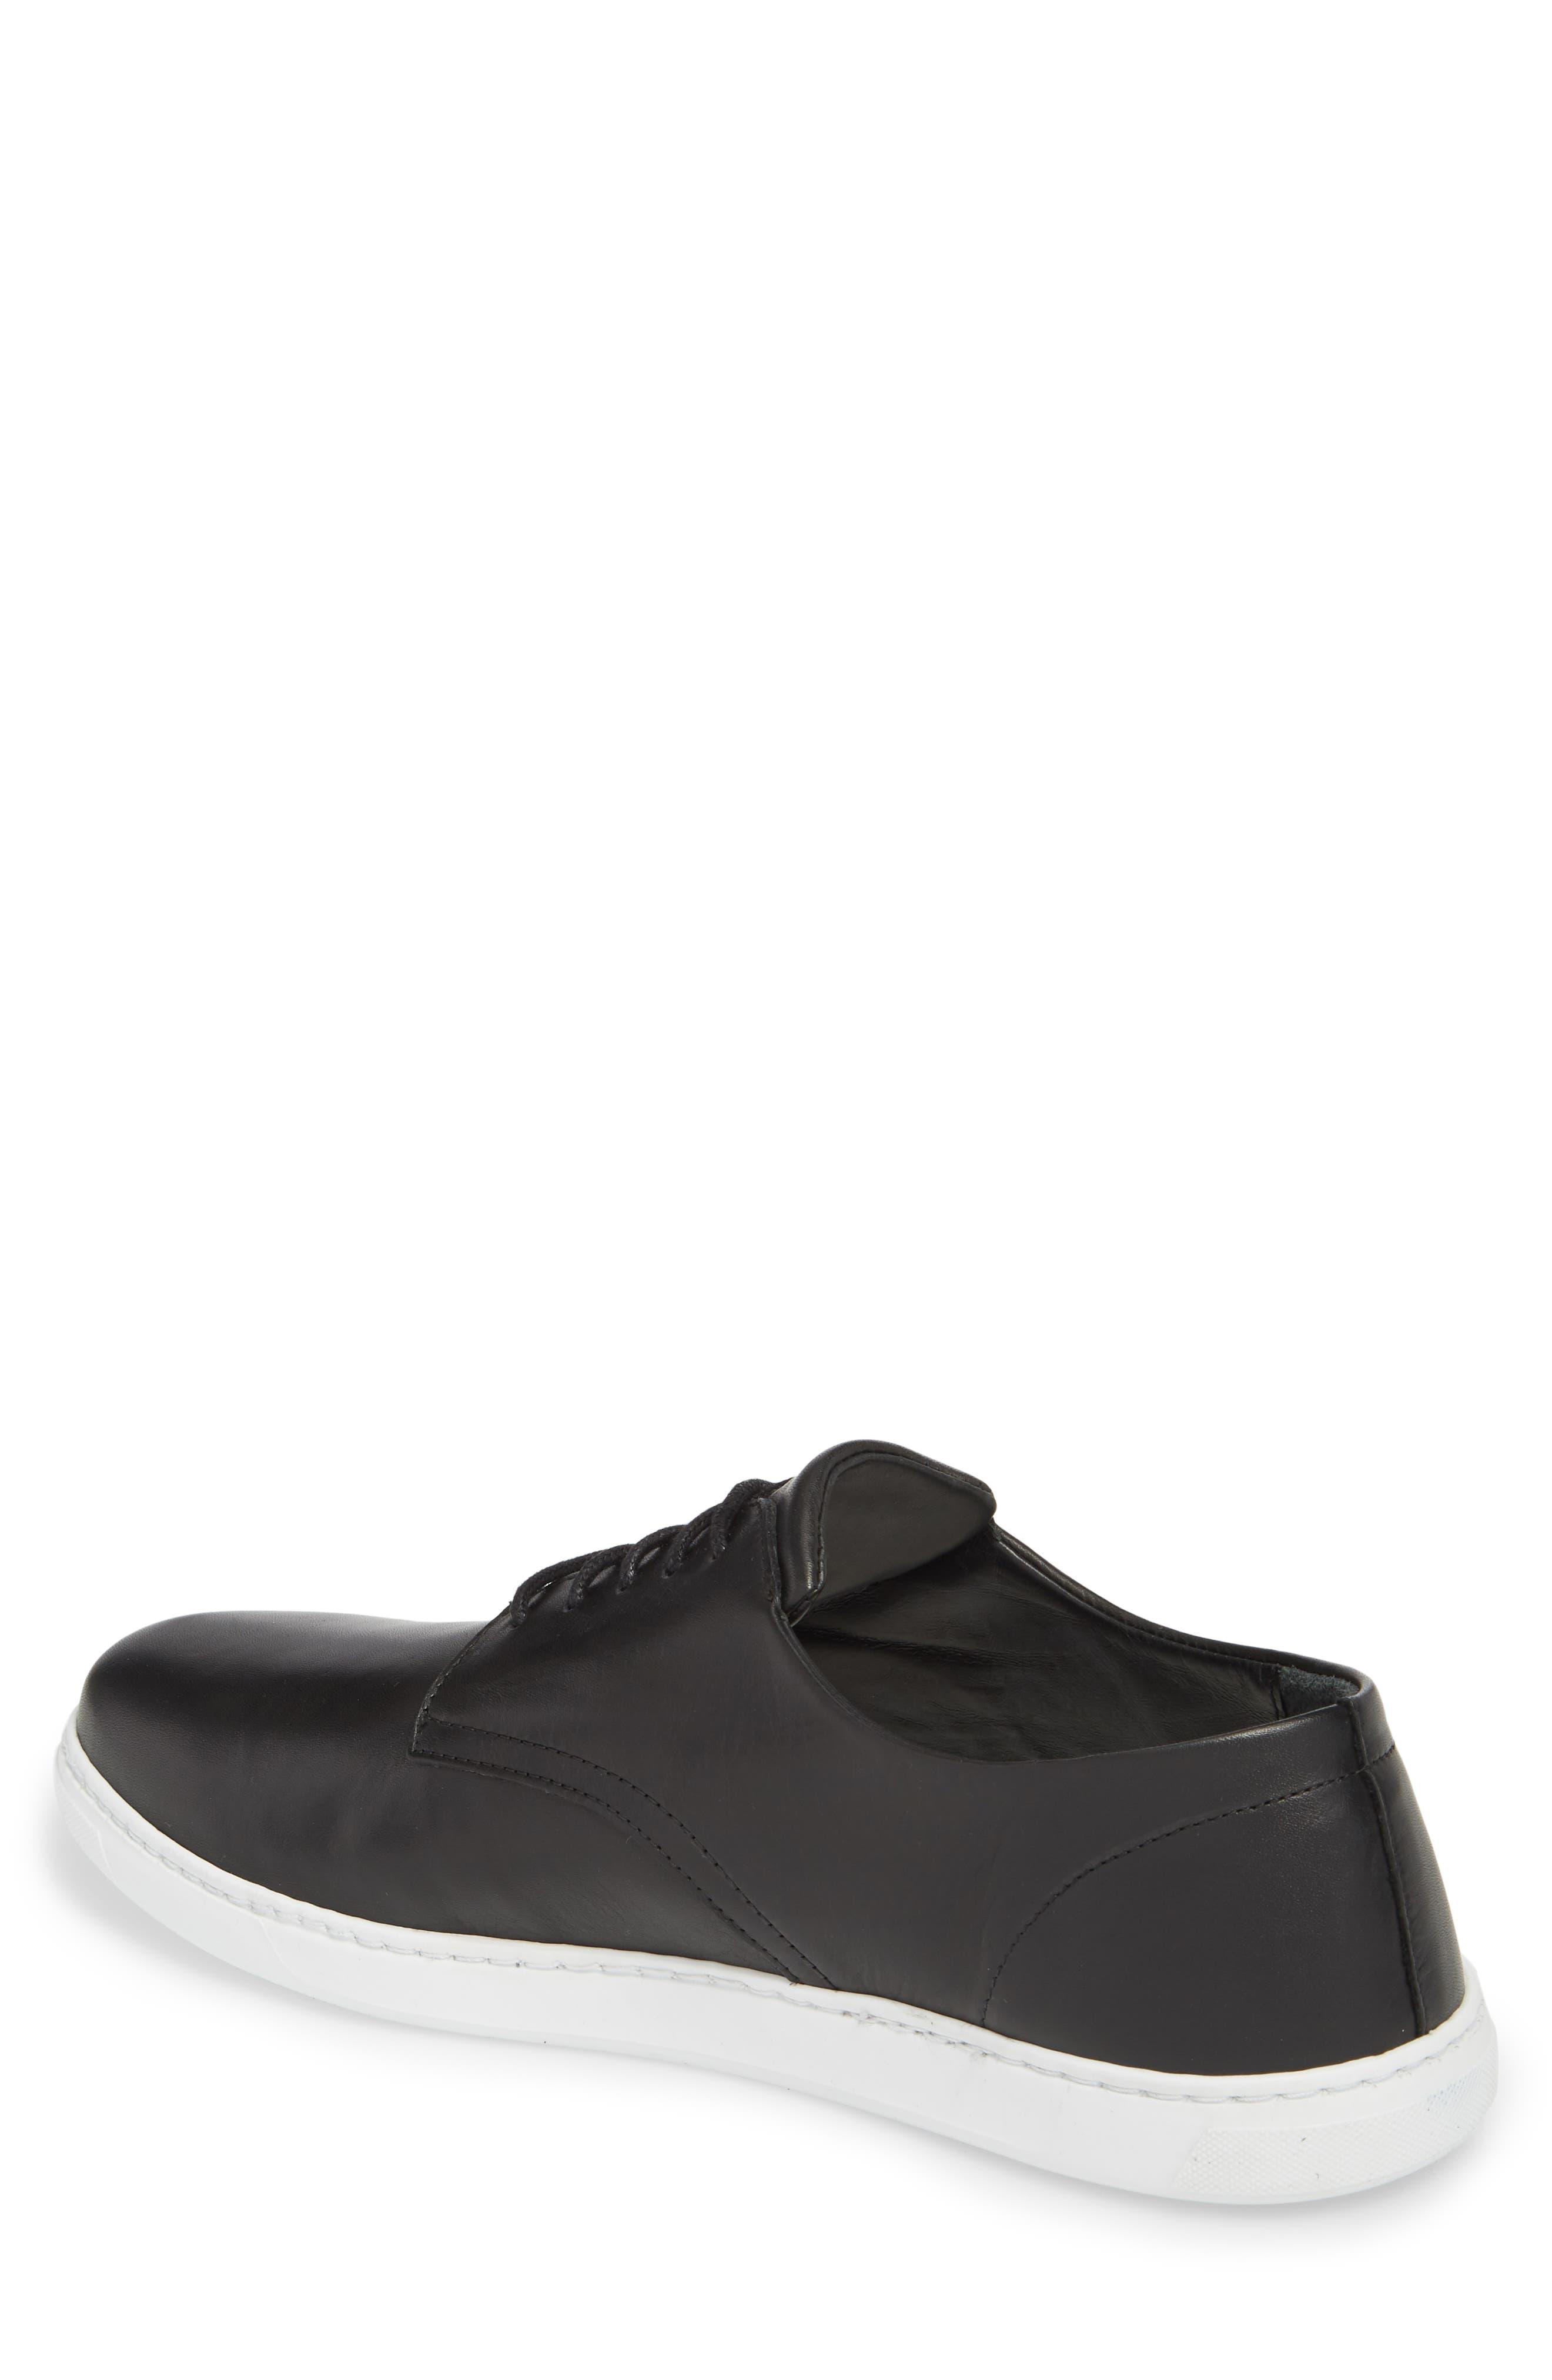 Nok Derby Sneaker,                             Alternate thumbnail 2, color,                             BLACK LEATHER